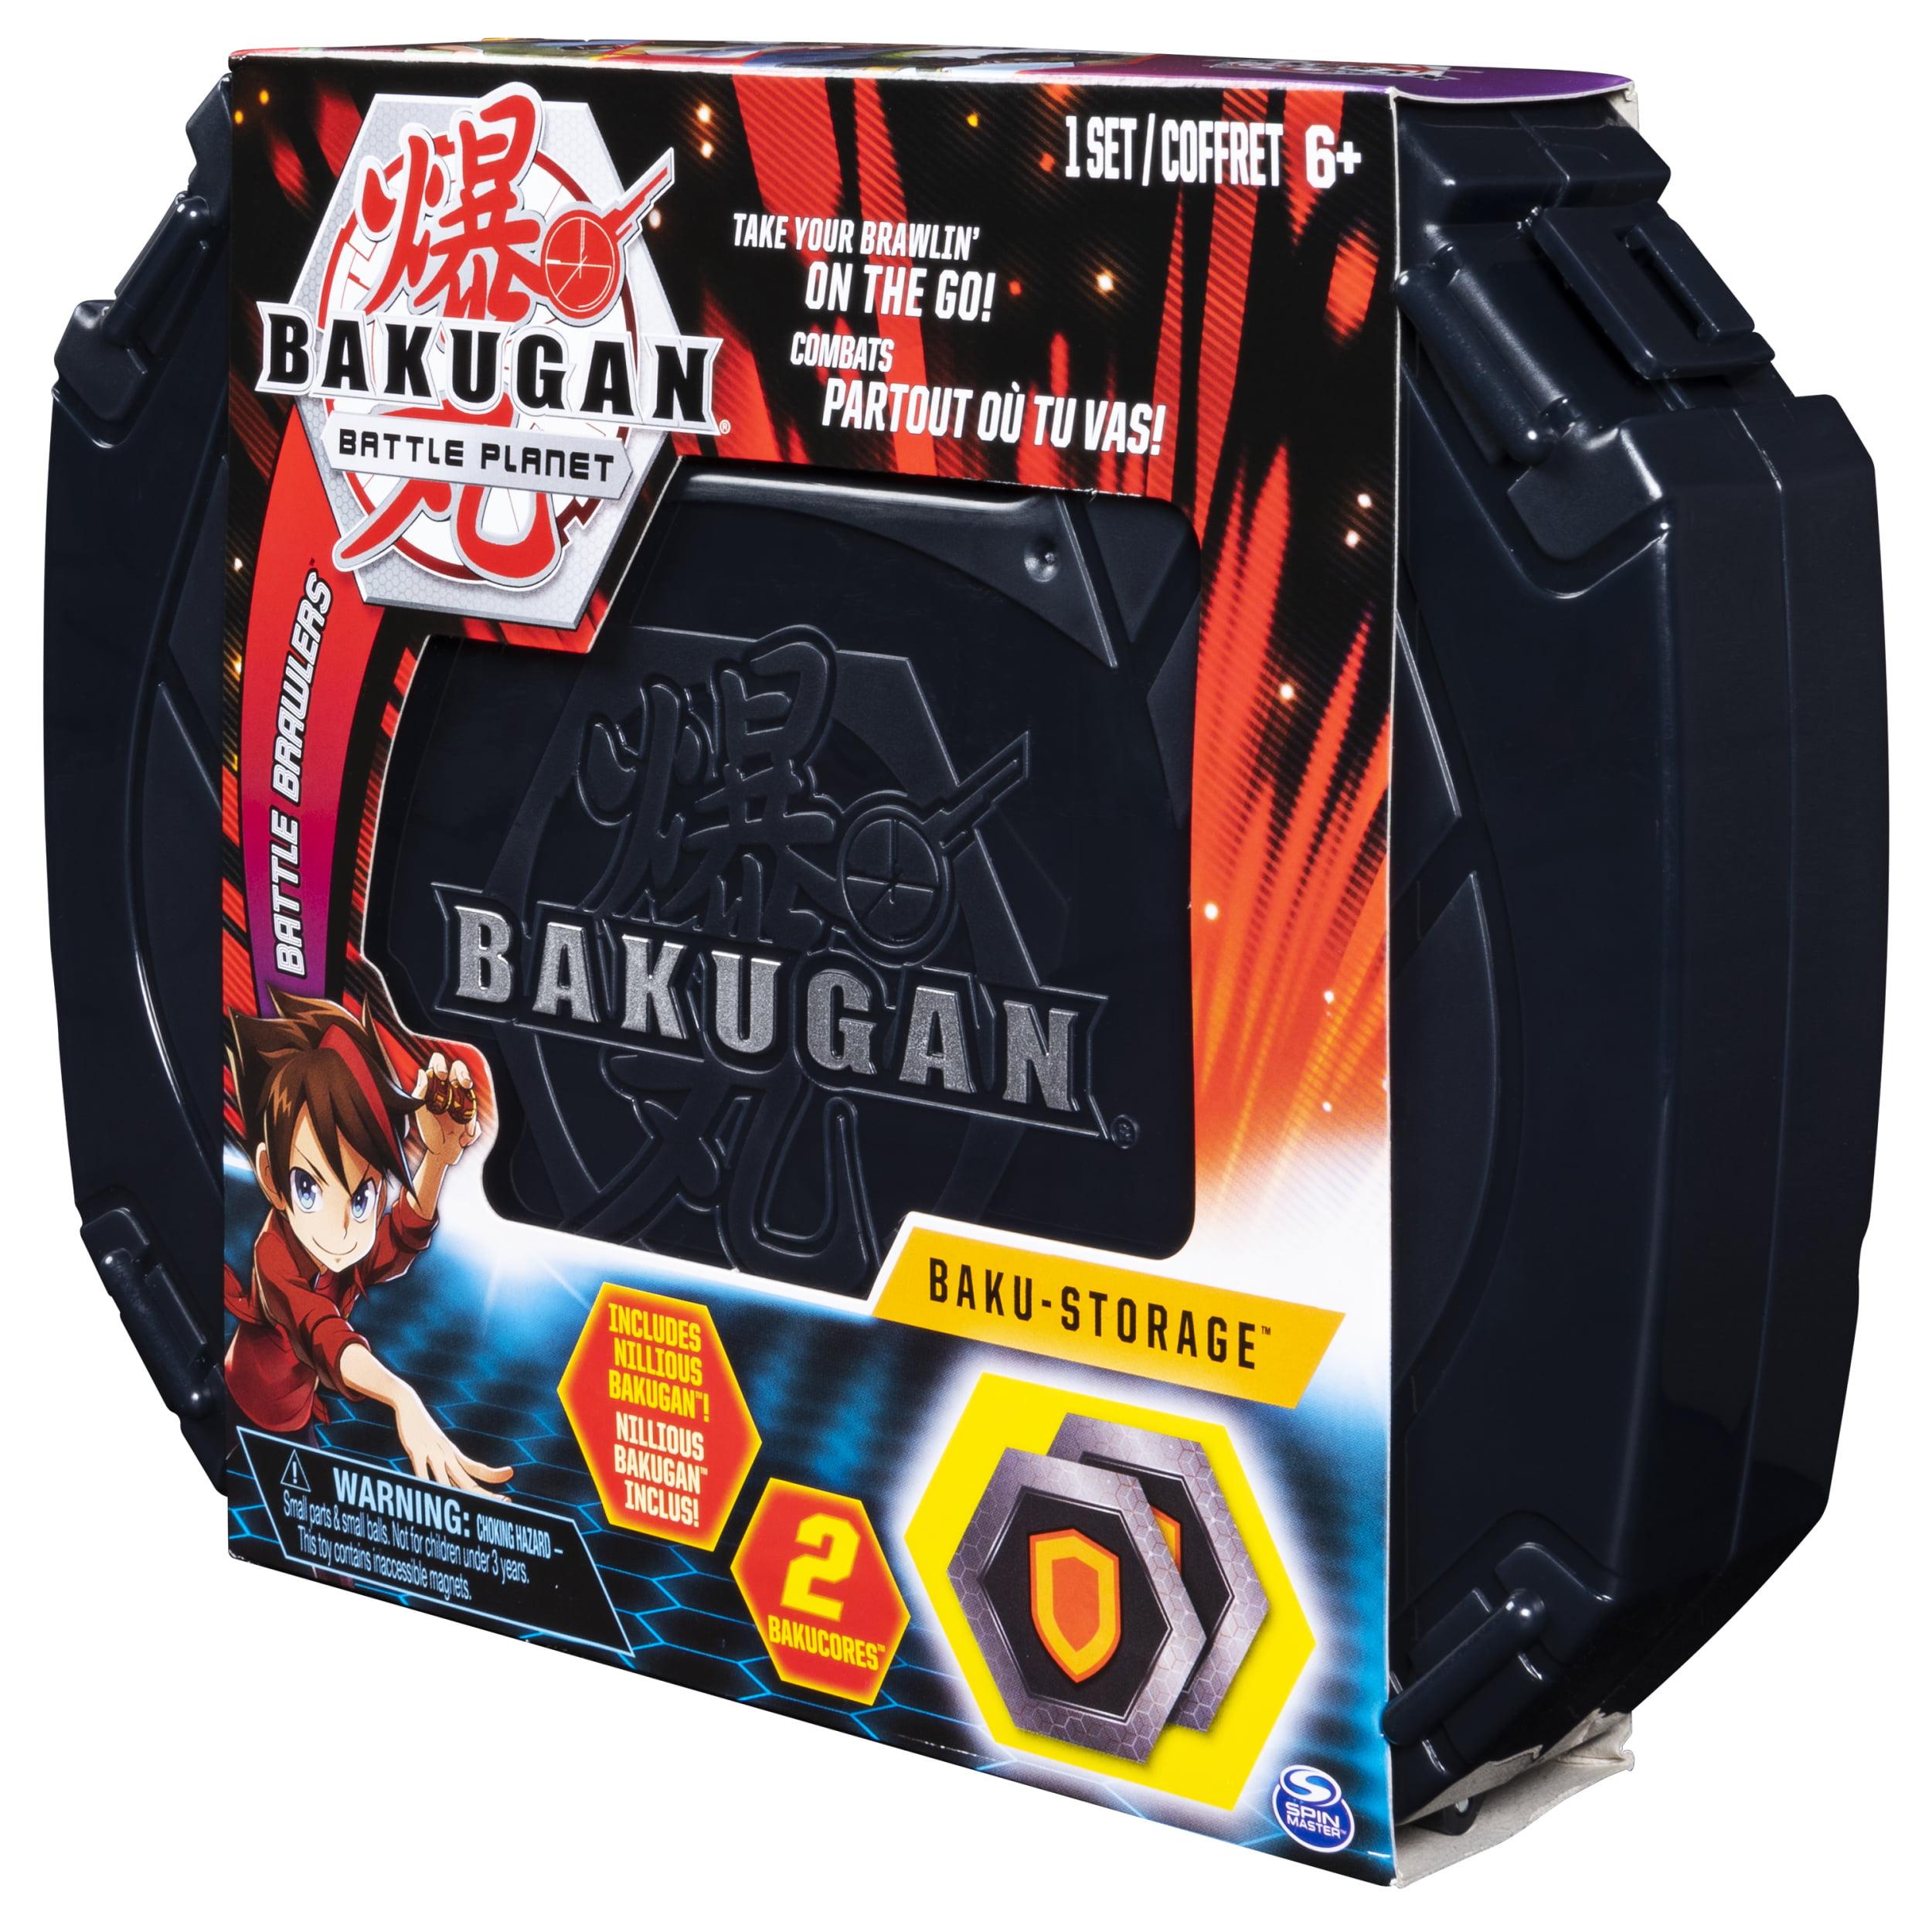 Baku-storage Case for BAKUGAN Collectible Action Figures for Ages 6 BAKUGAN